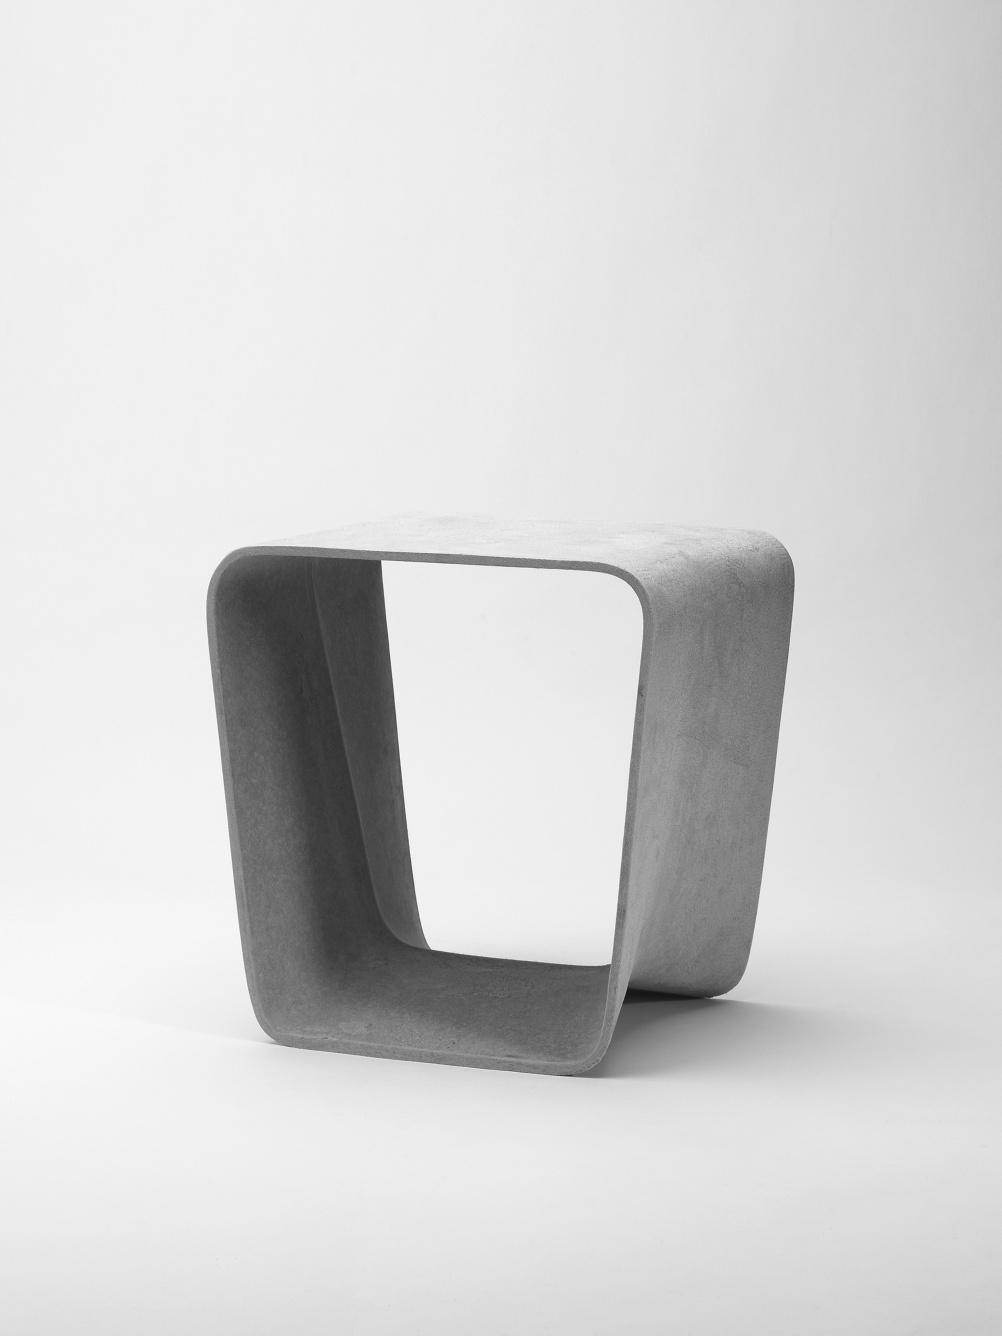 ECAL Eternit Stool, by Nicolas Le Moigne, 2007 - Present